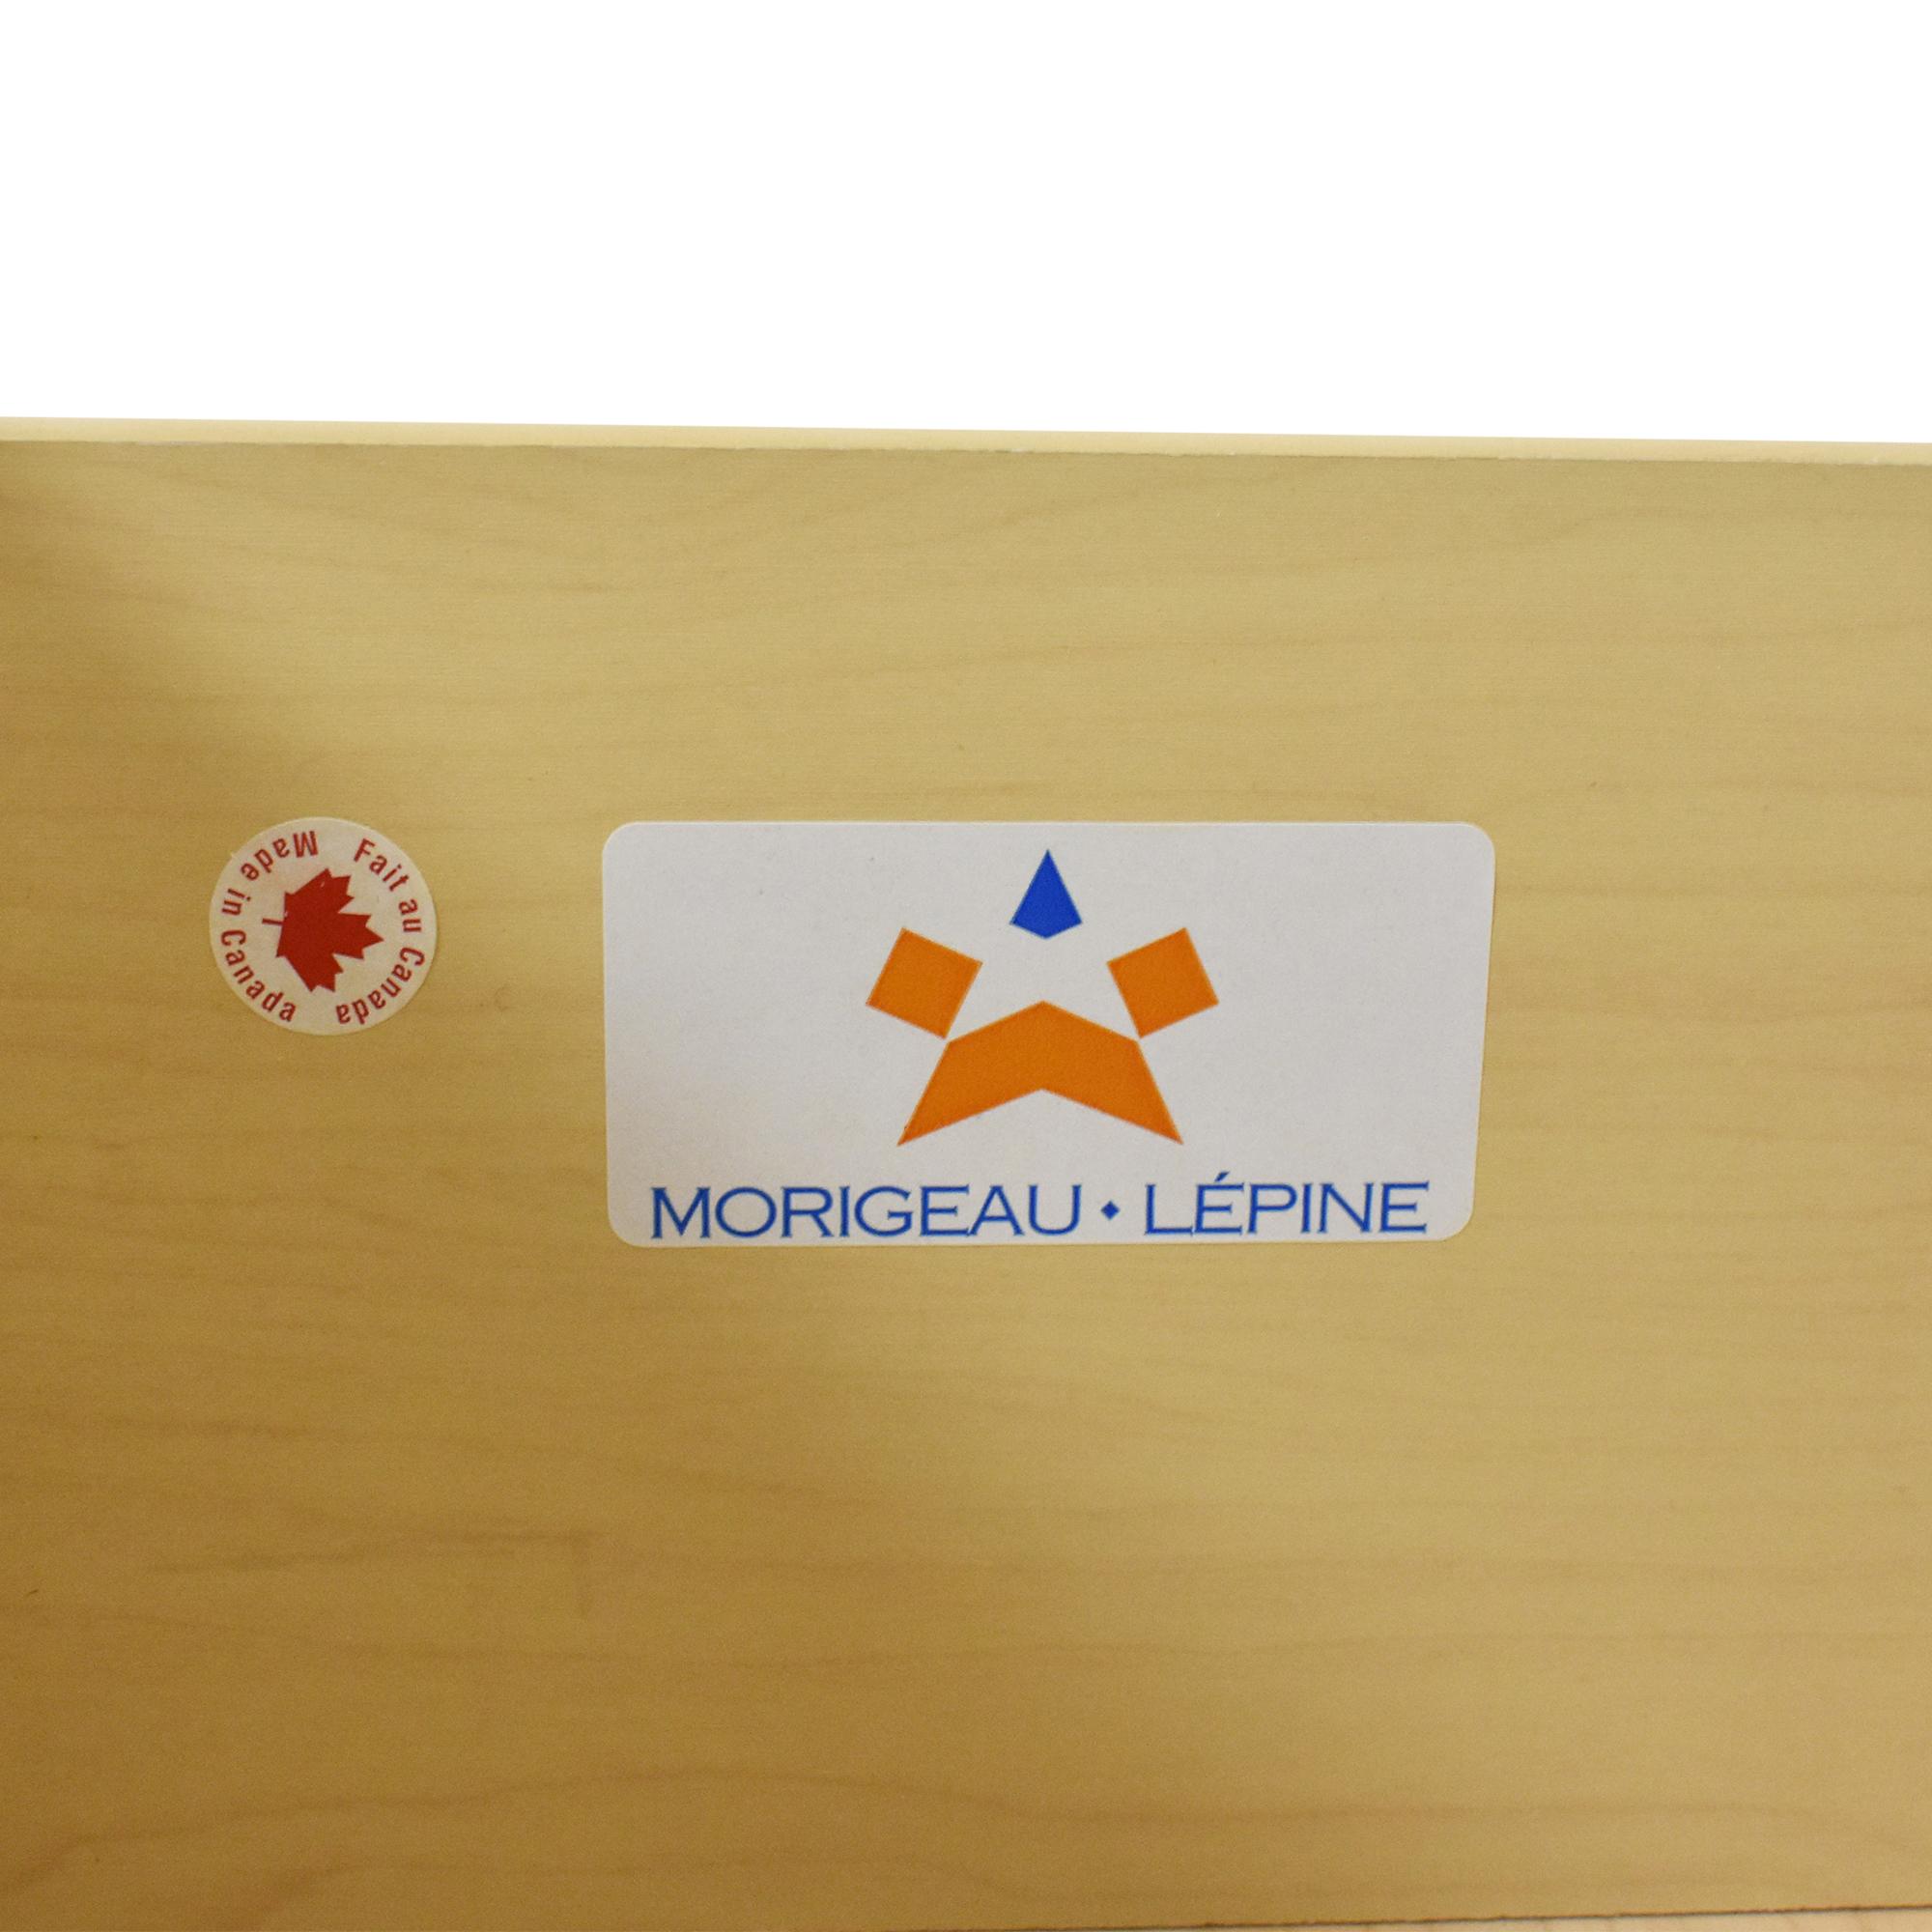 Morigeau-Lepine Morigeau-Lepine Armoire price